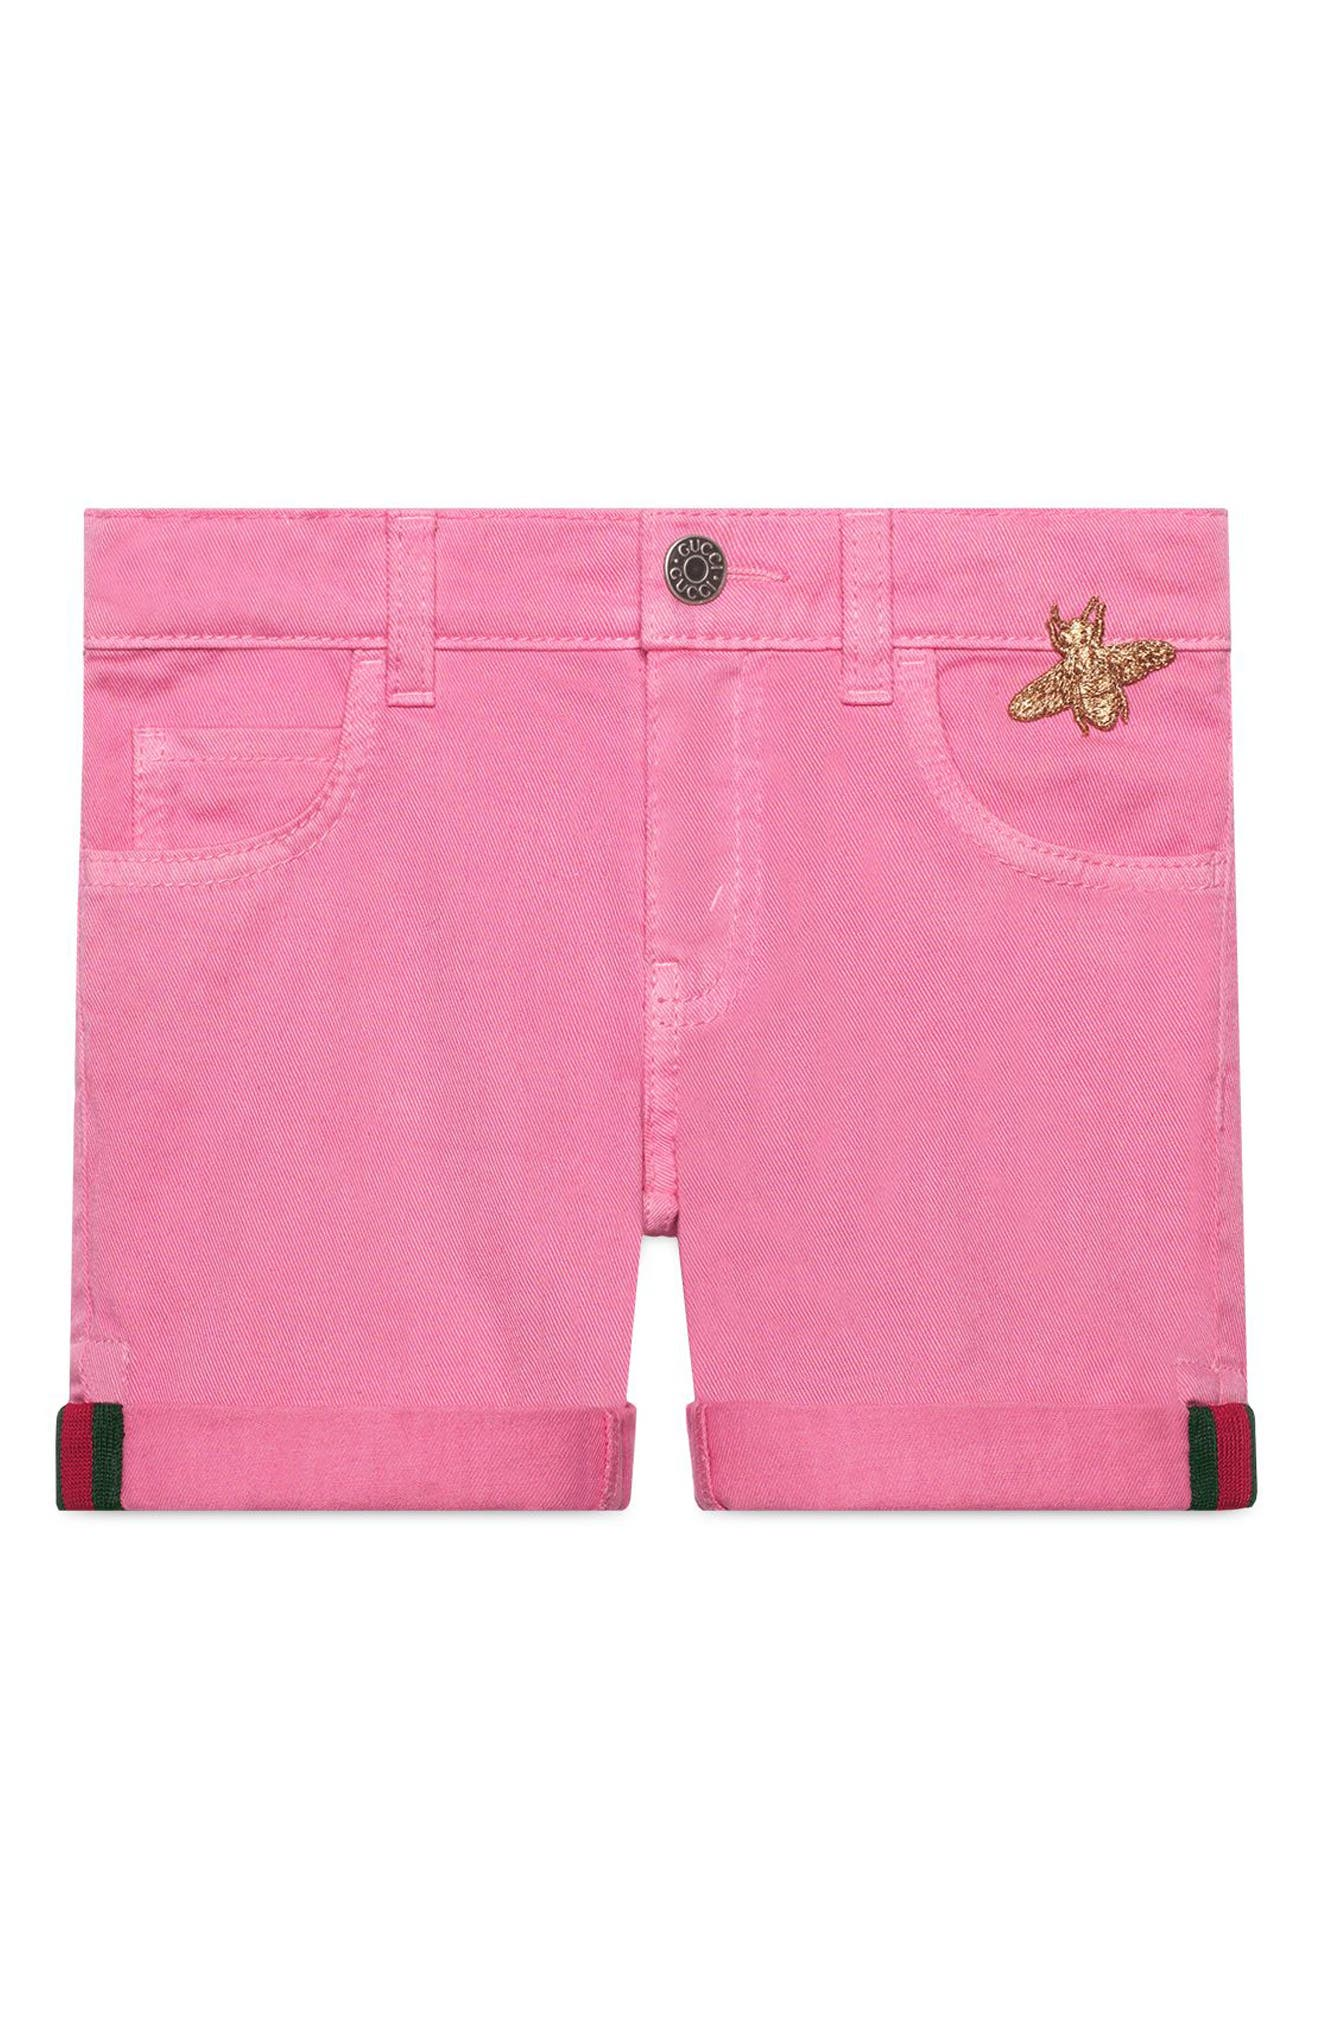 Pink Denim Cuffed Shorts,                             Main thumbnail 1, color,                             COPPER/ ROSE